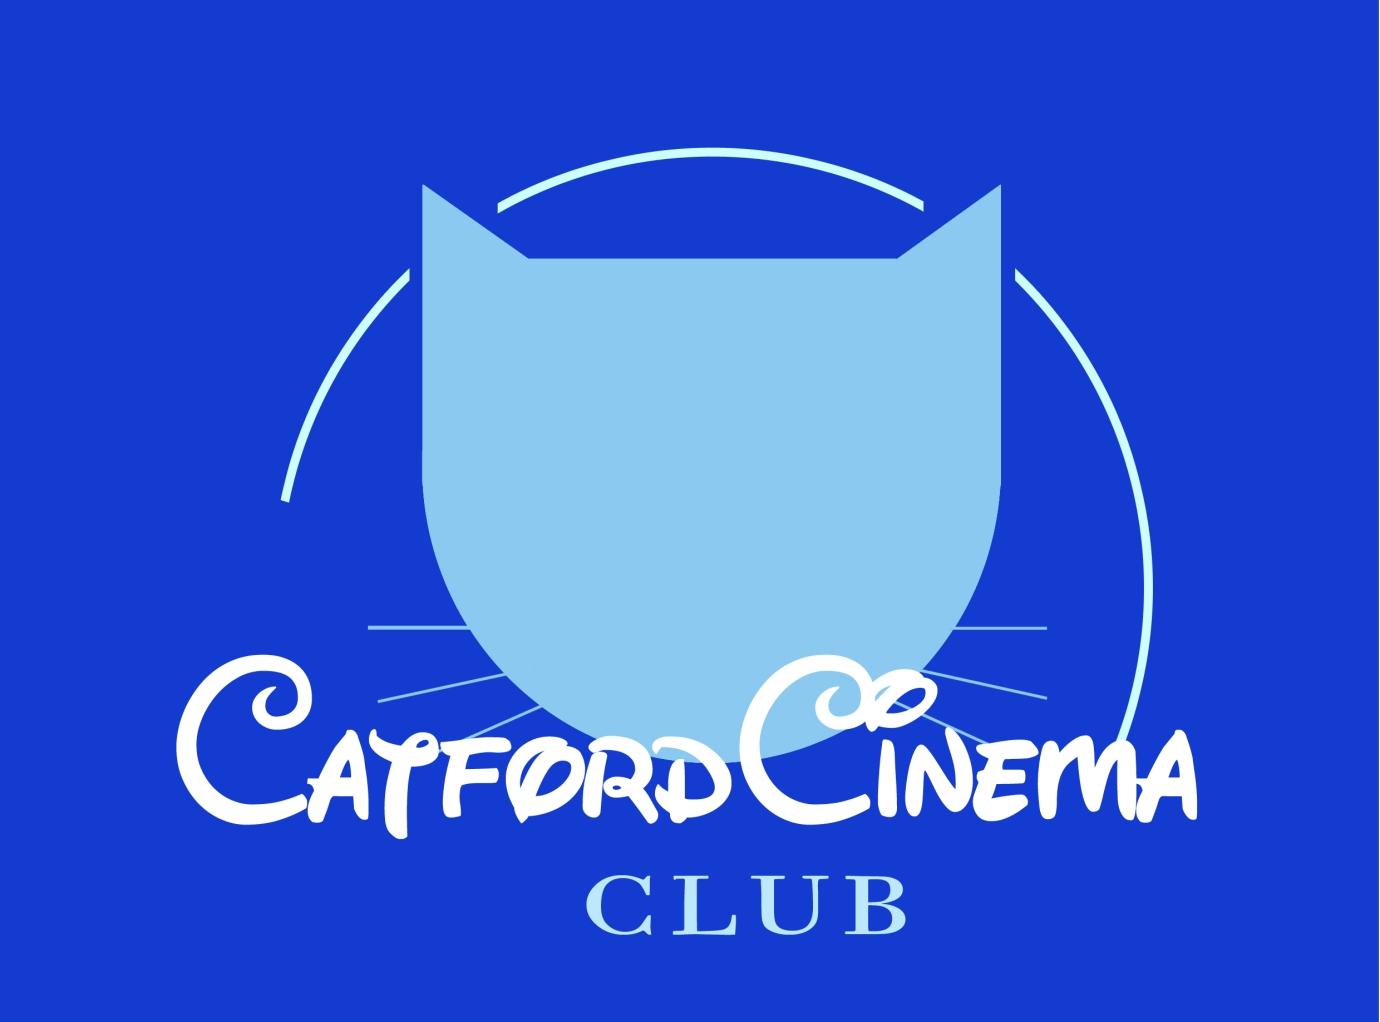 Catford Cinema Club Logo